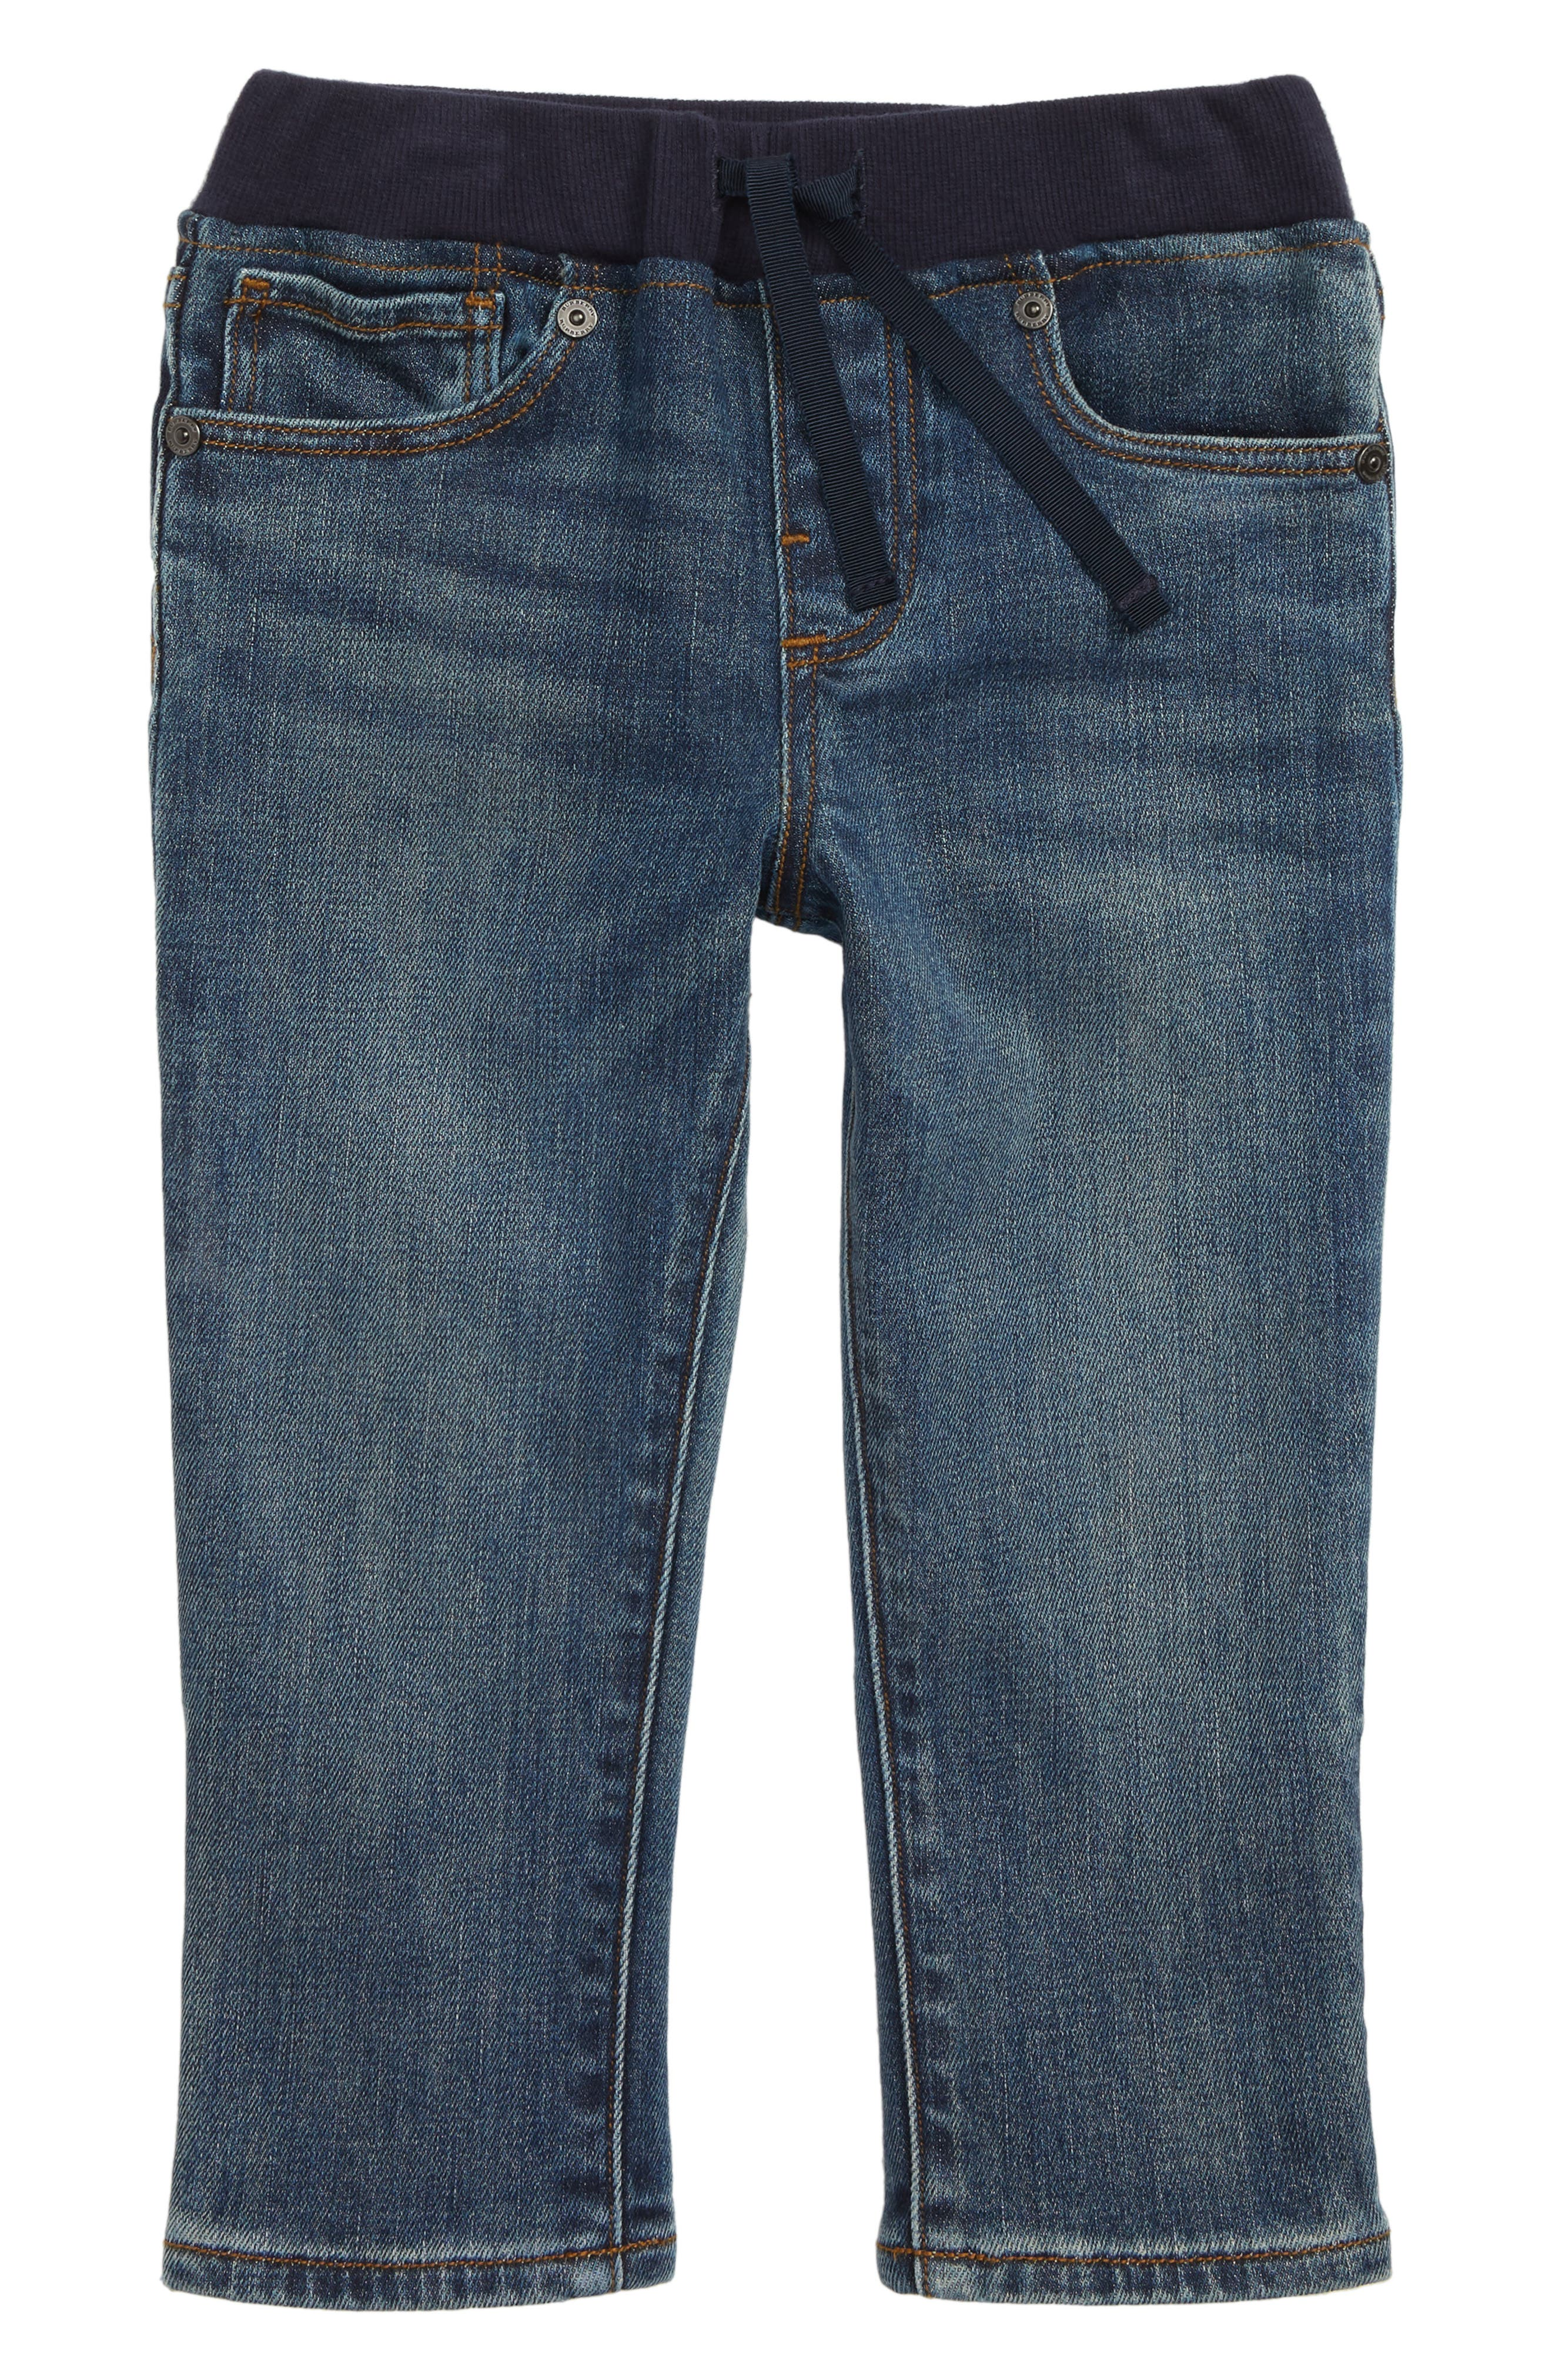 Pull-On Jeans,                             Main thumbnail 1, color,                             MID INDIGO